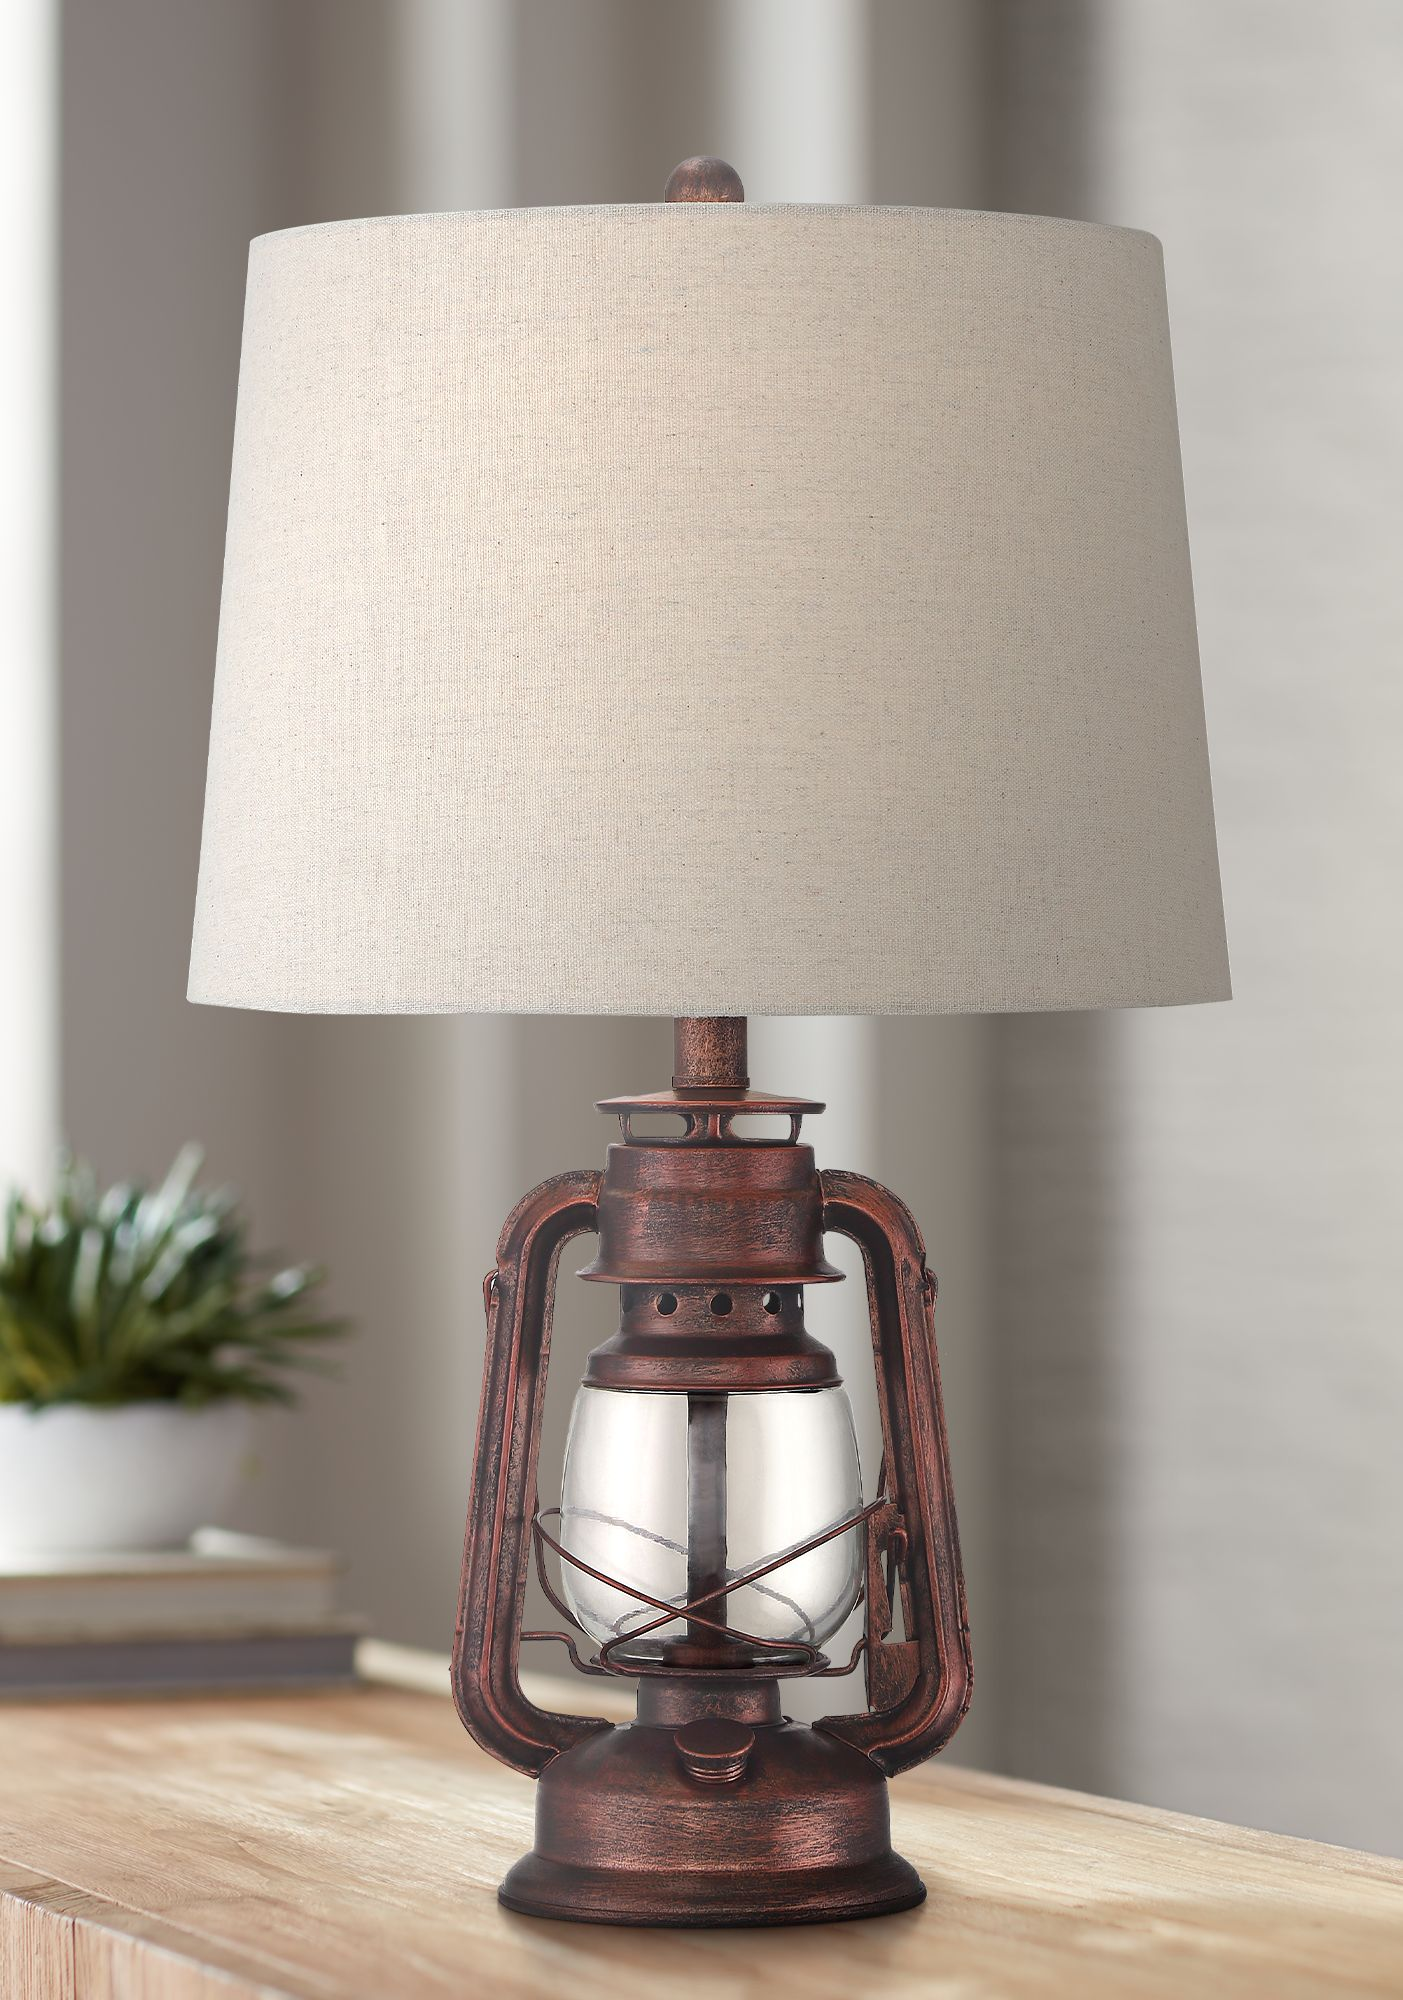 franklin iron works lighting lighting